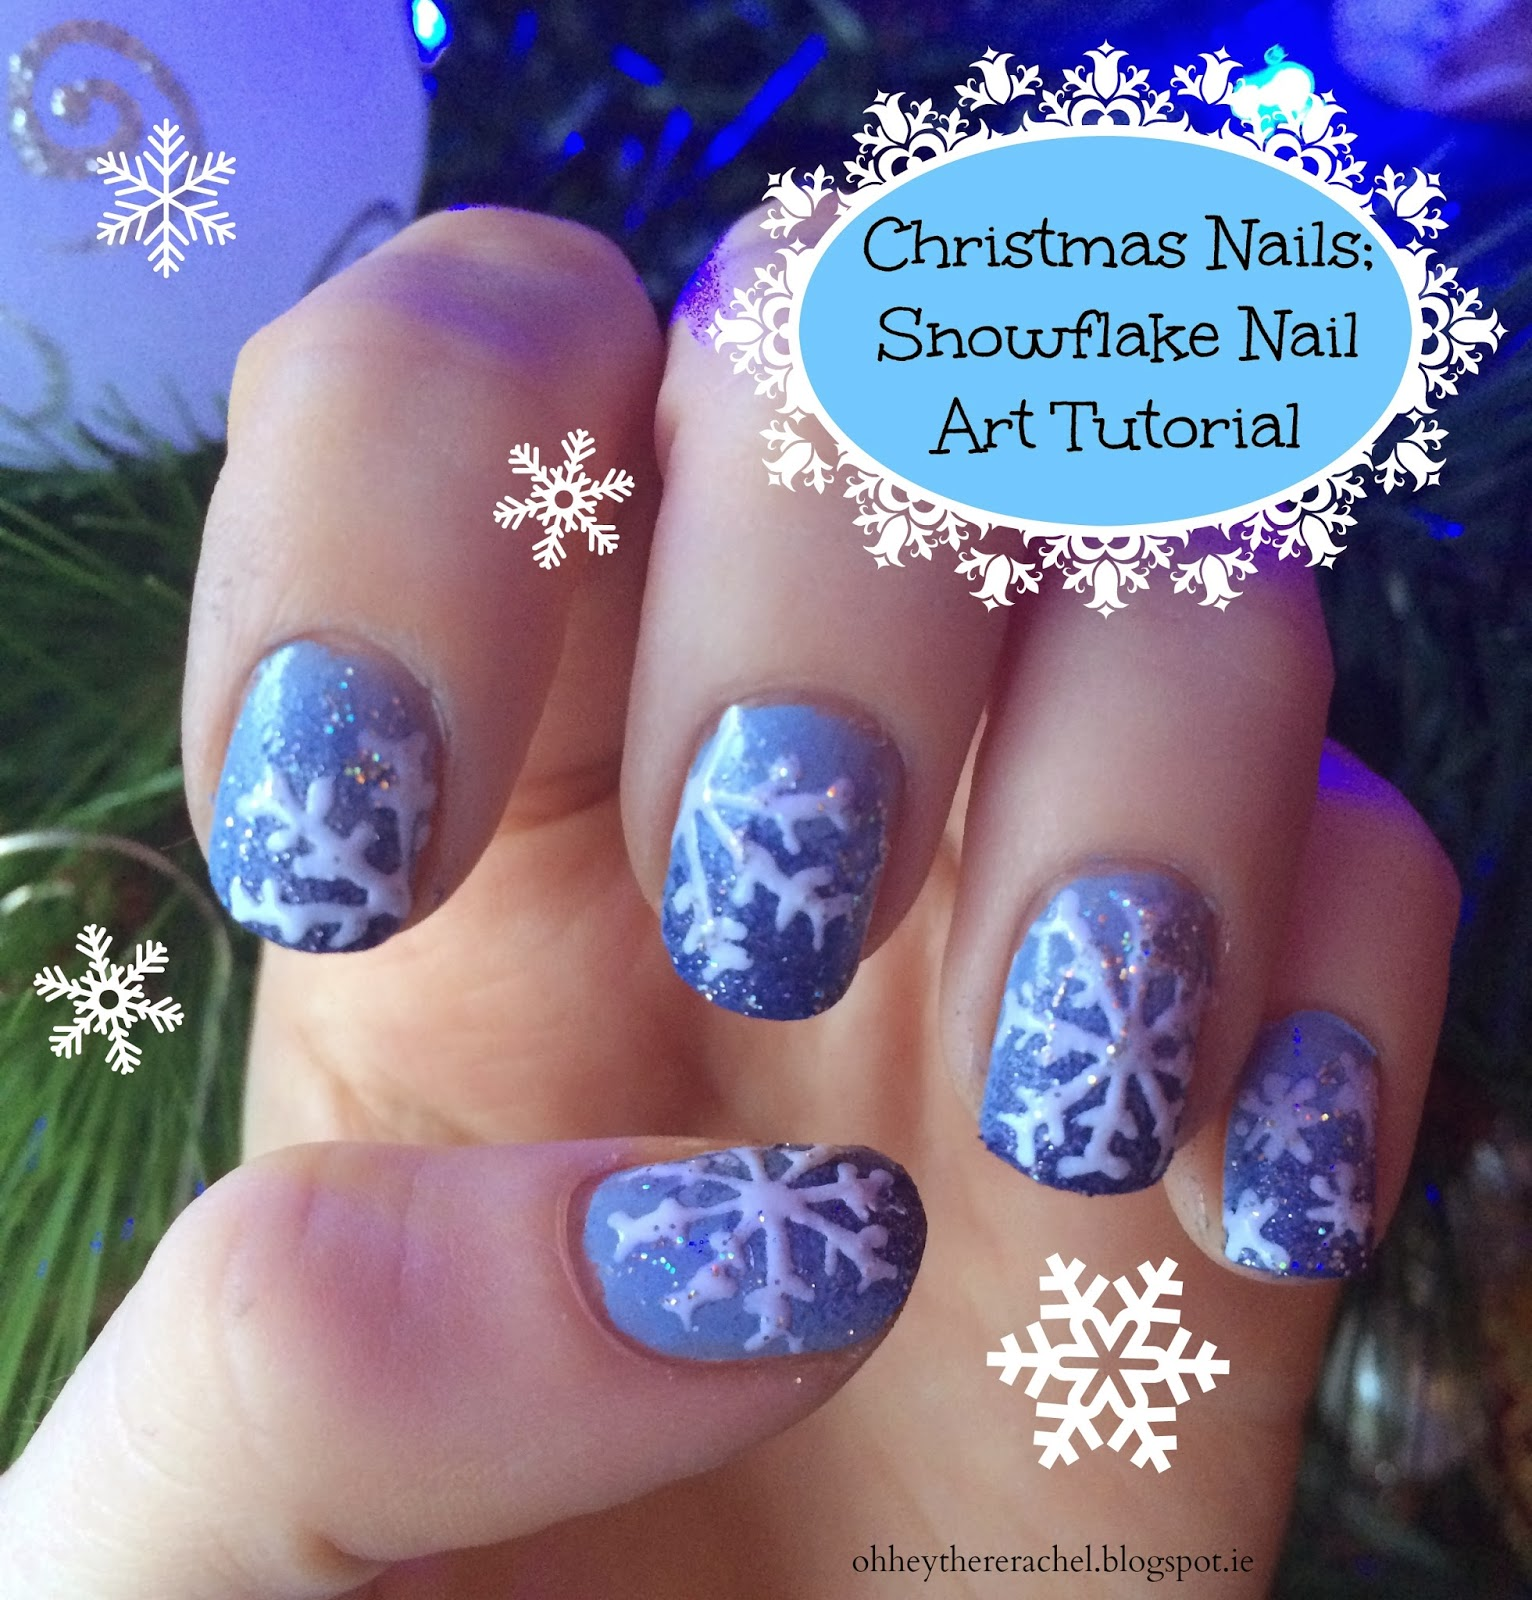 Christmas Nail Art Tutorial Gingerbread Galore: Christmas Nails; Snowflake Nail Art Tutorial